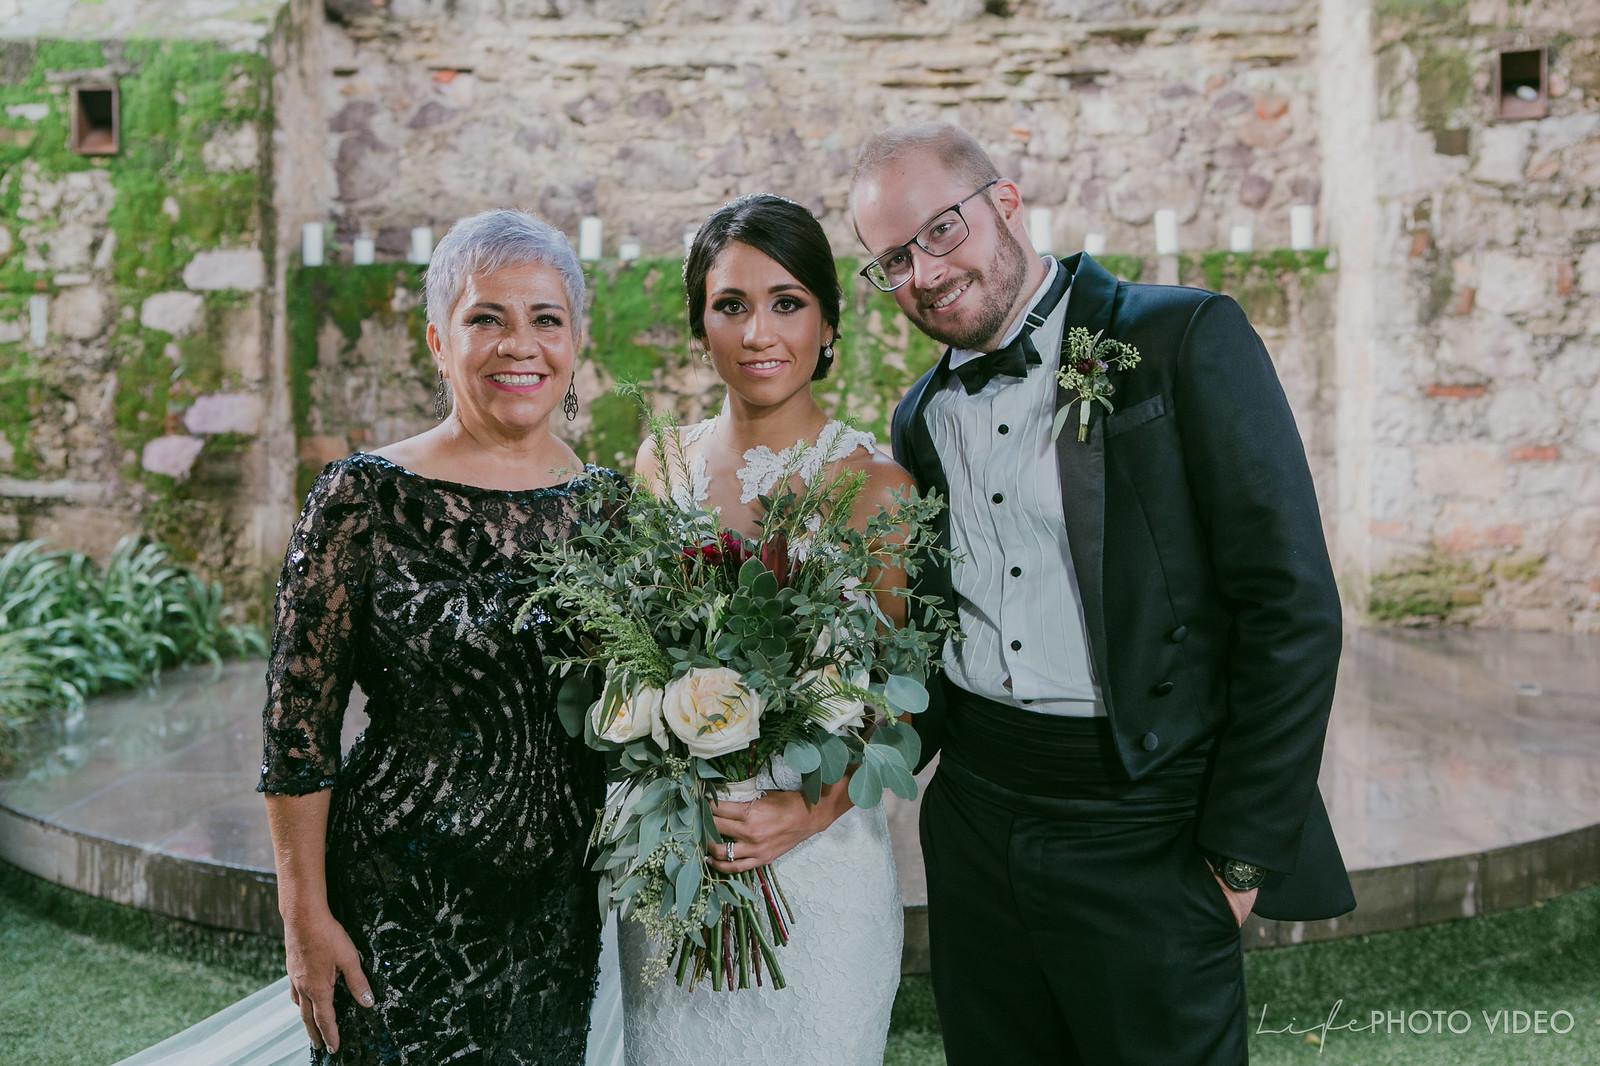 LifePhotoVideo_Boda_Guanajuato_Wedding_0026